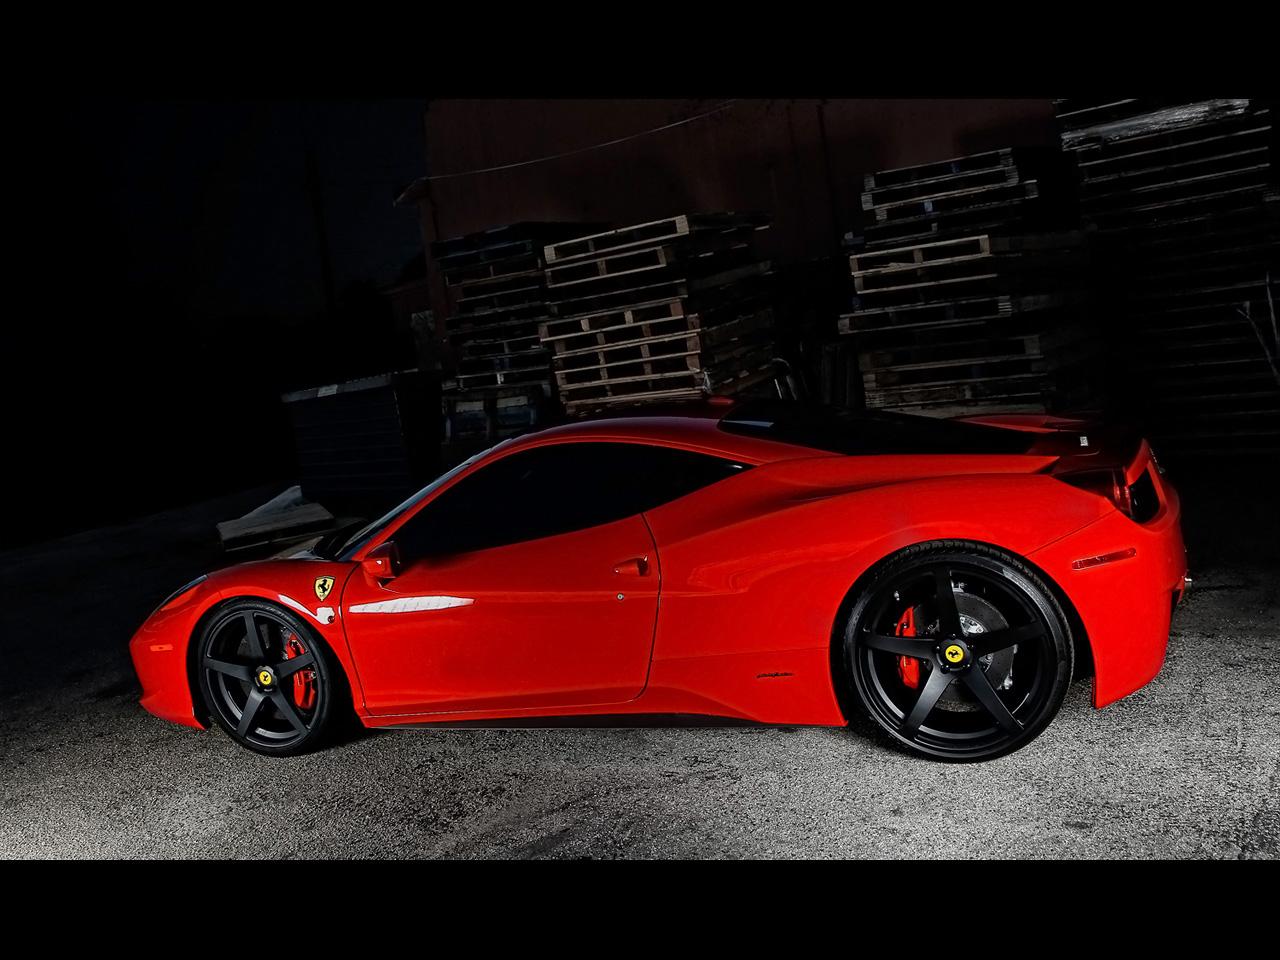 farari car in high defination download red car in high defination %25281%2529